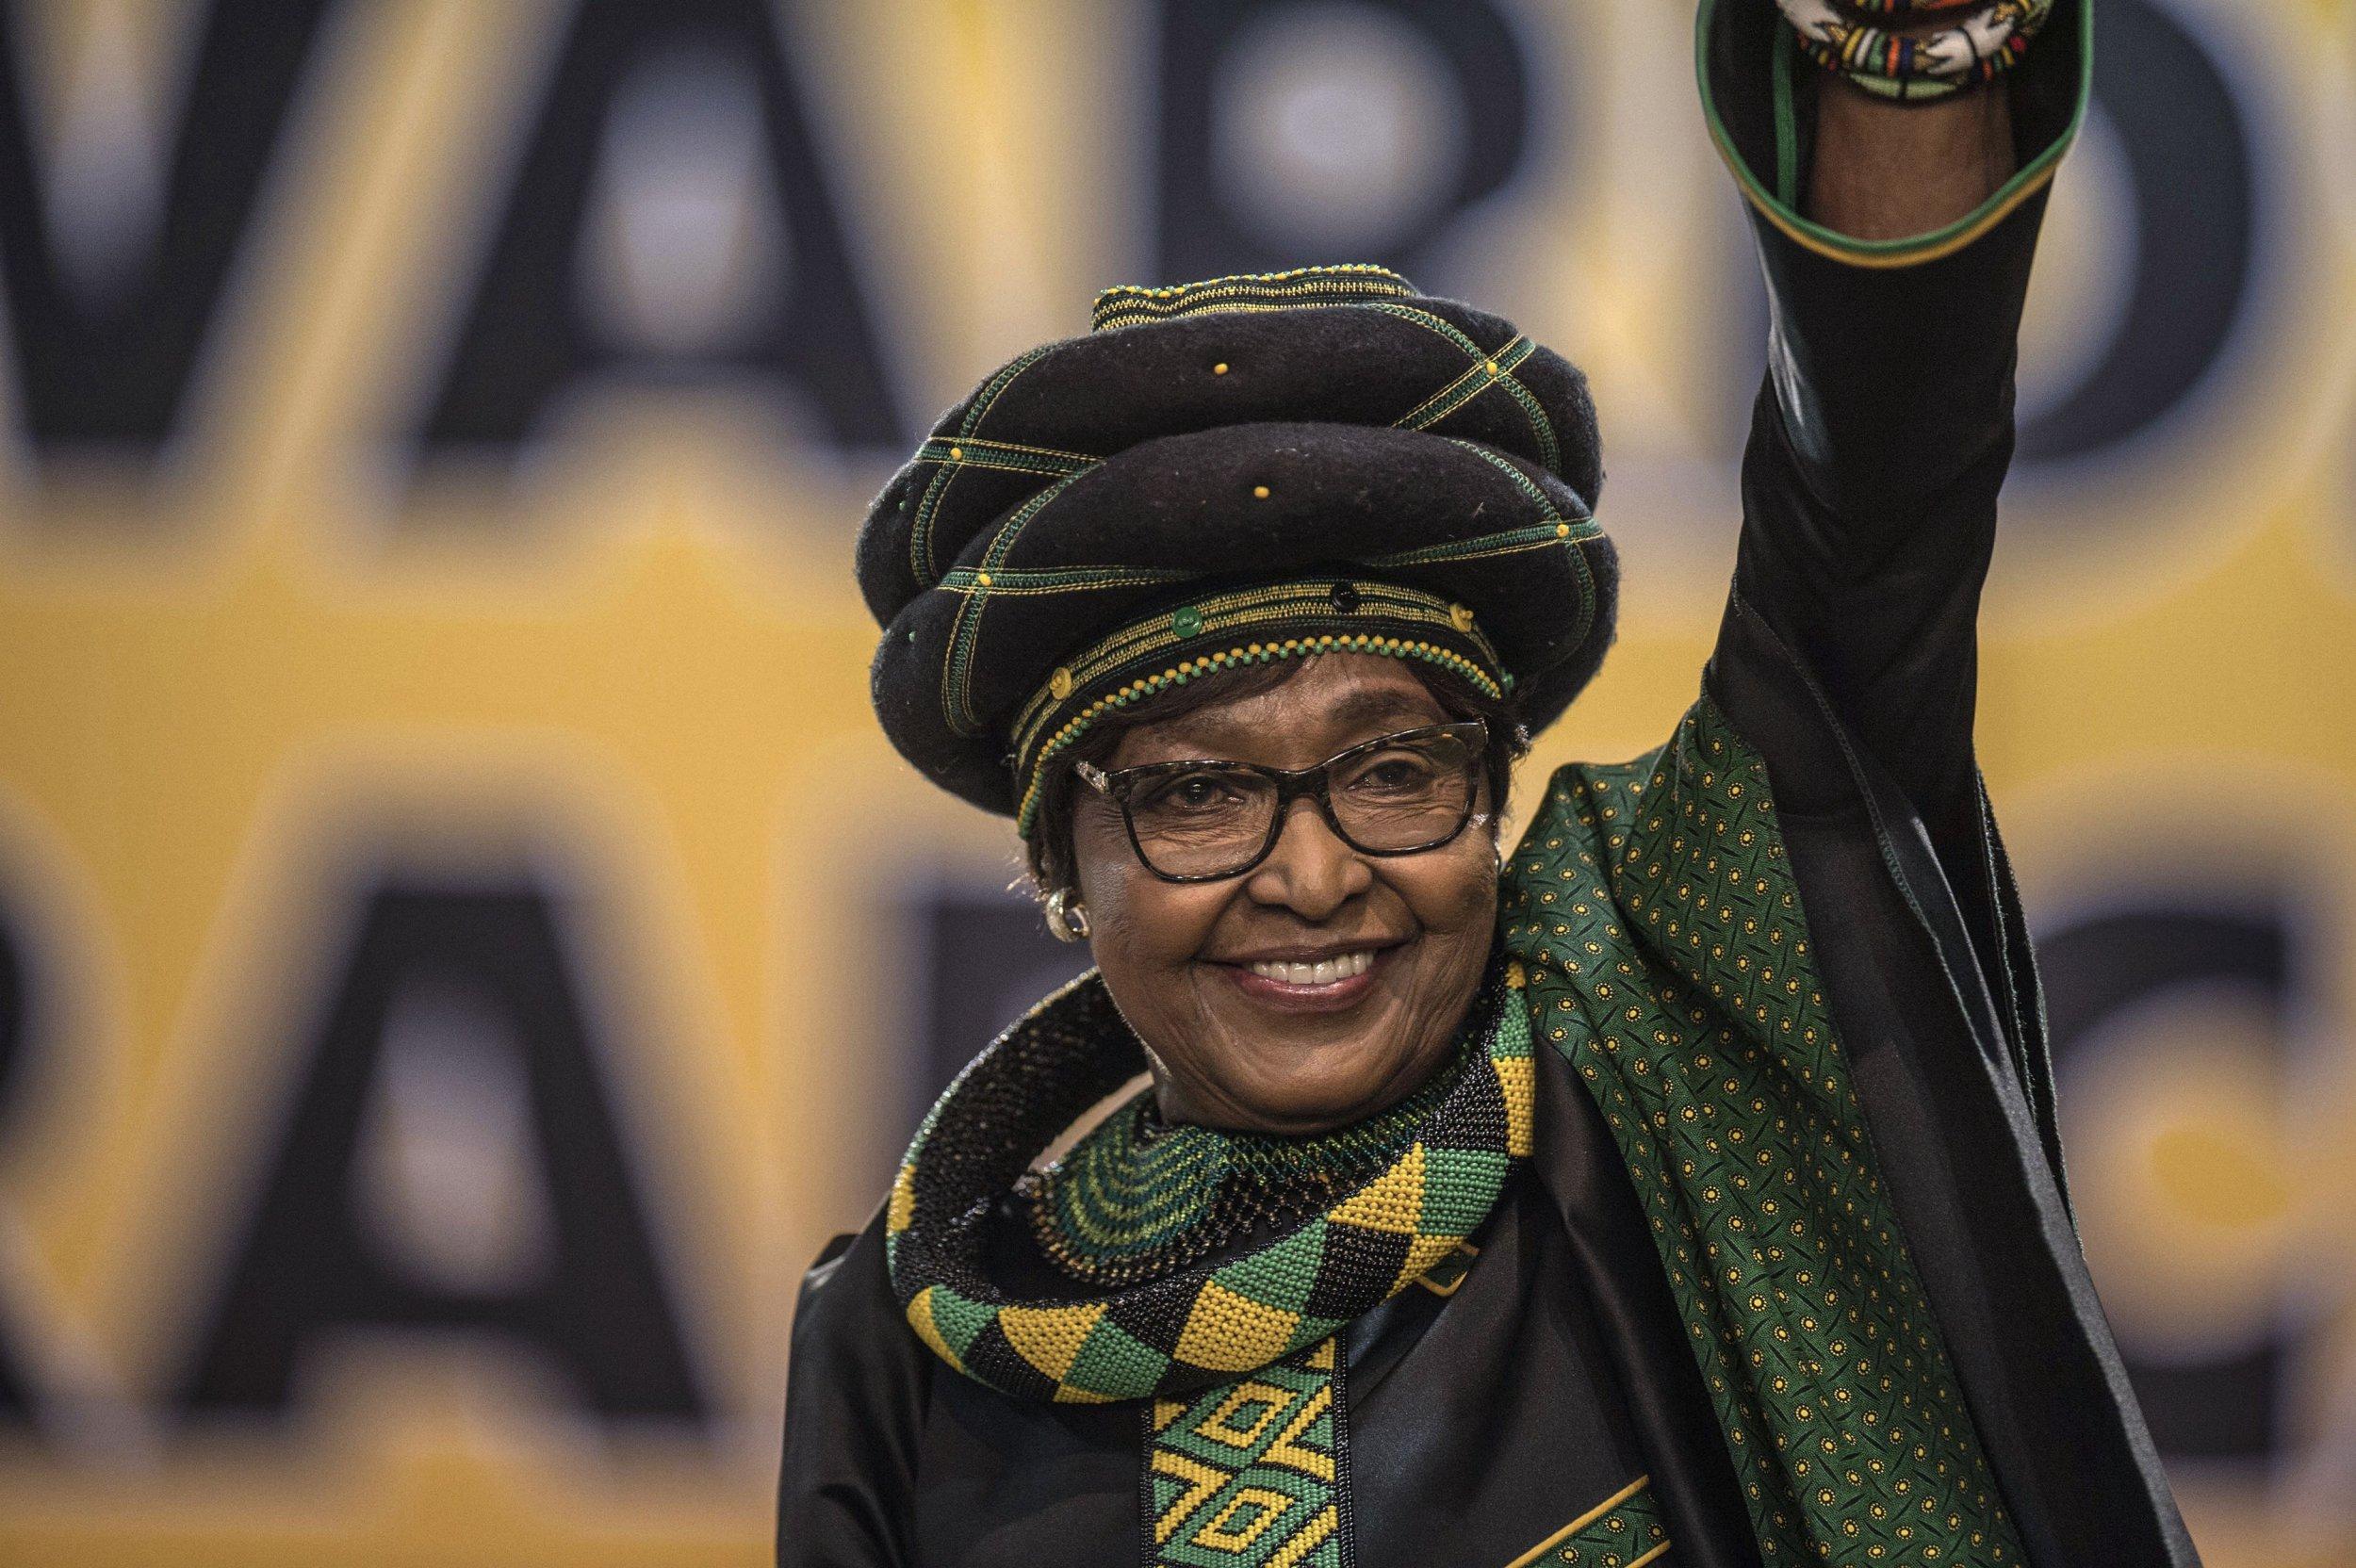 Winnie Madikizela-Mandela rushed to hospital with kidney infection